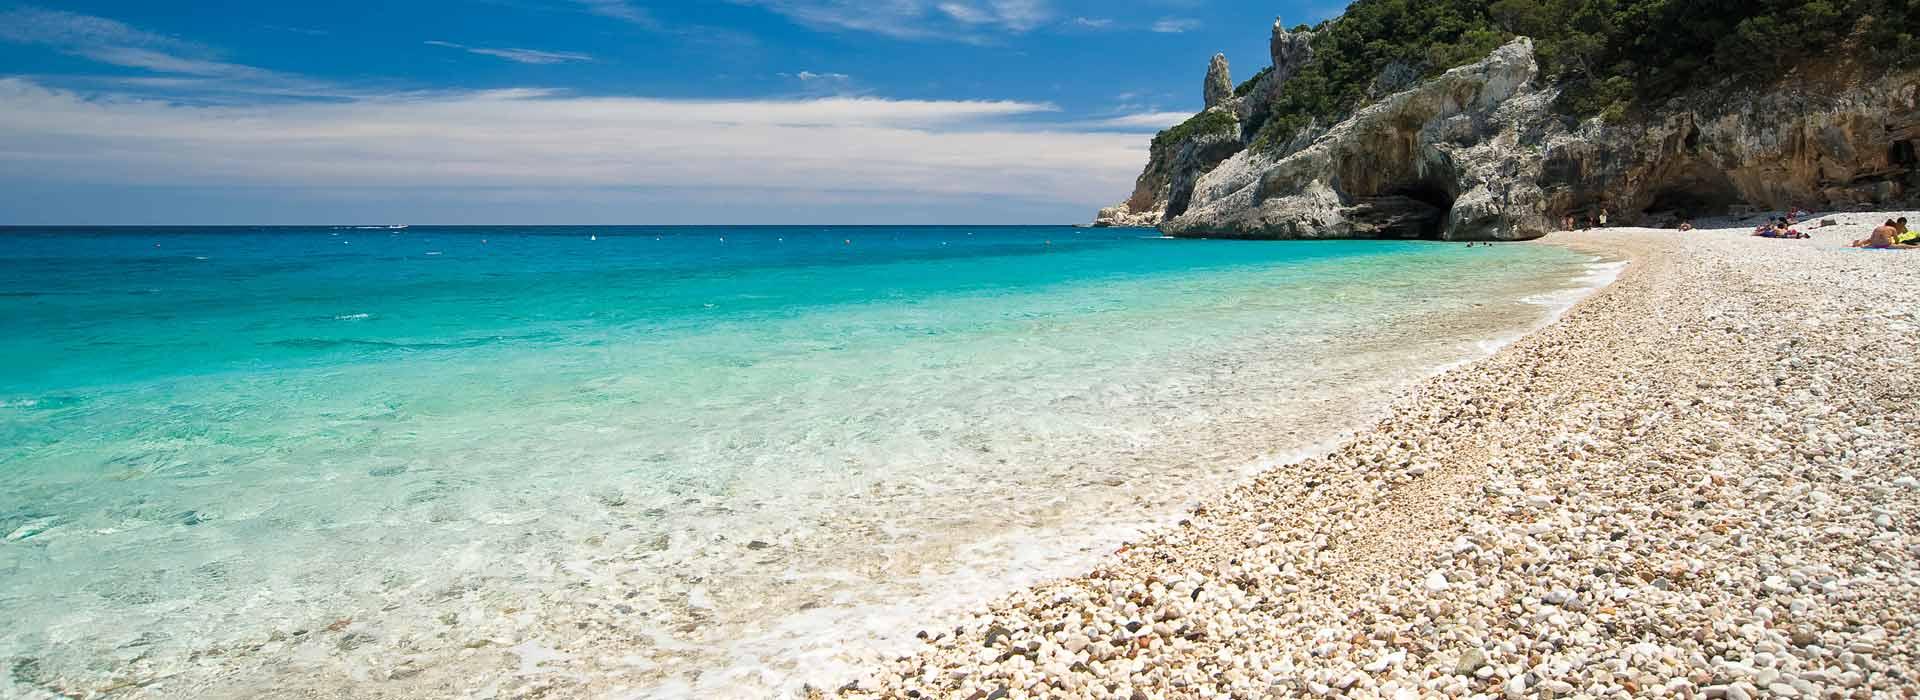 Spiagge Sardegna - Cala Sisine